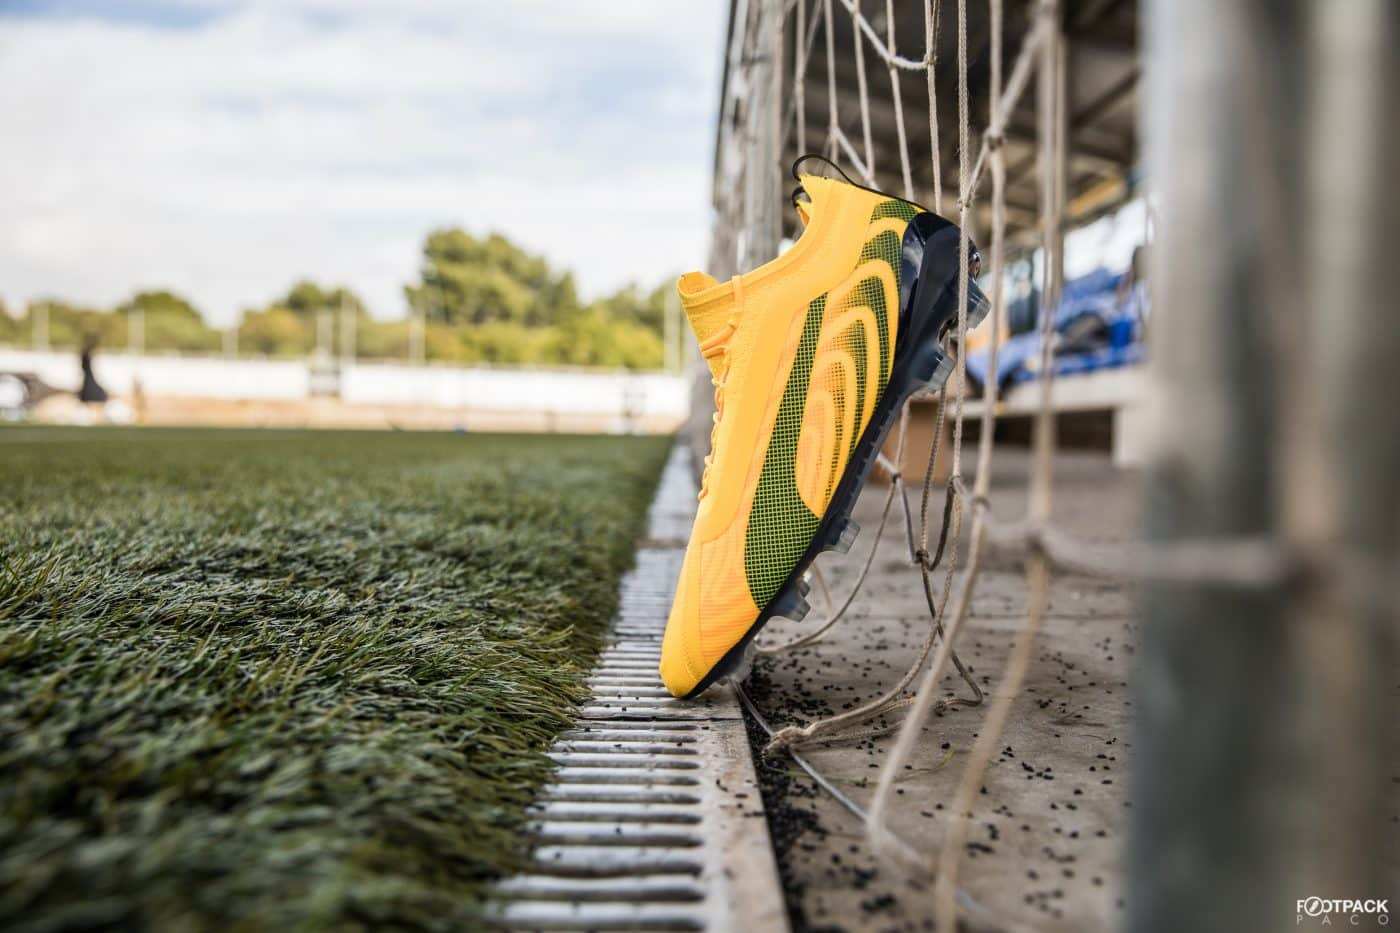 chaussures-de-foot-puma-one-5.1-spark-janvier-2020-footpack-7